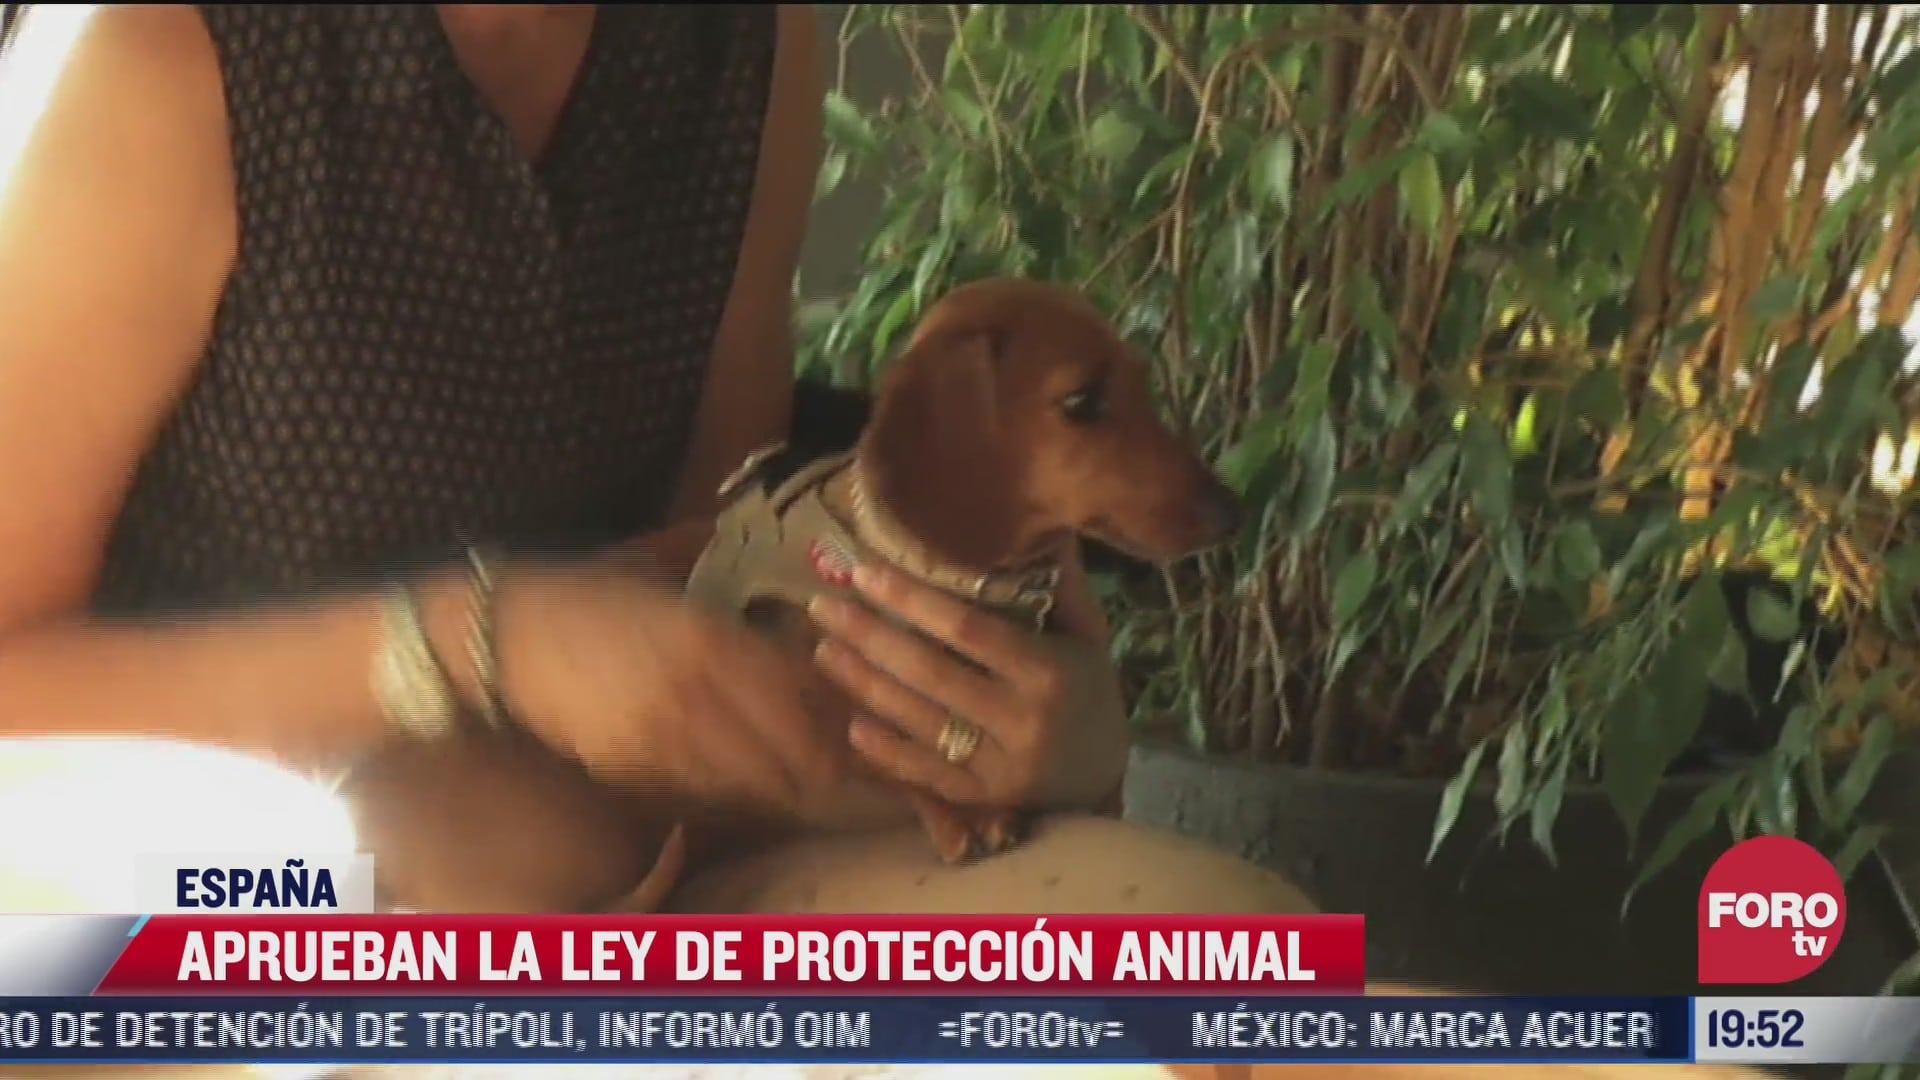 espana aprueba ley de proteccion a animal